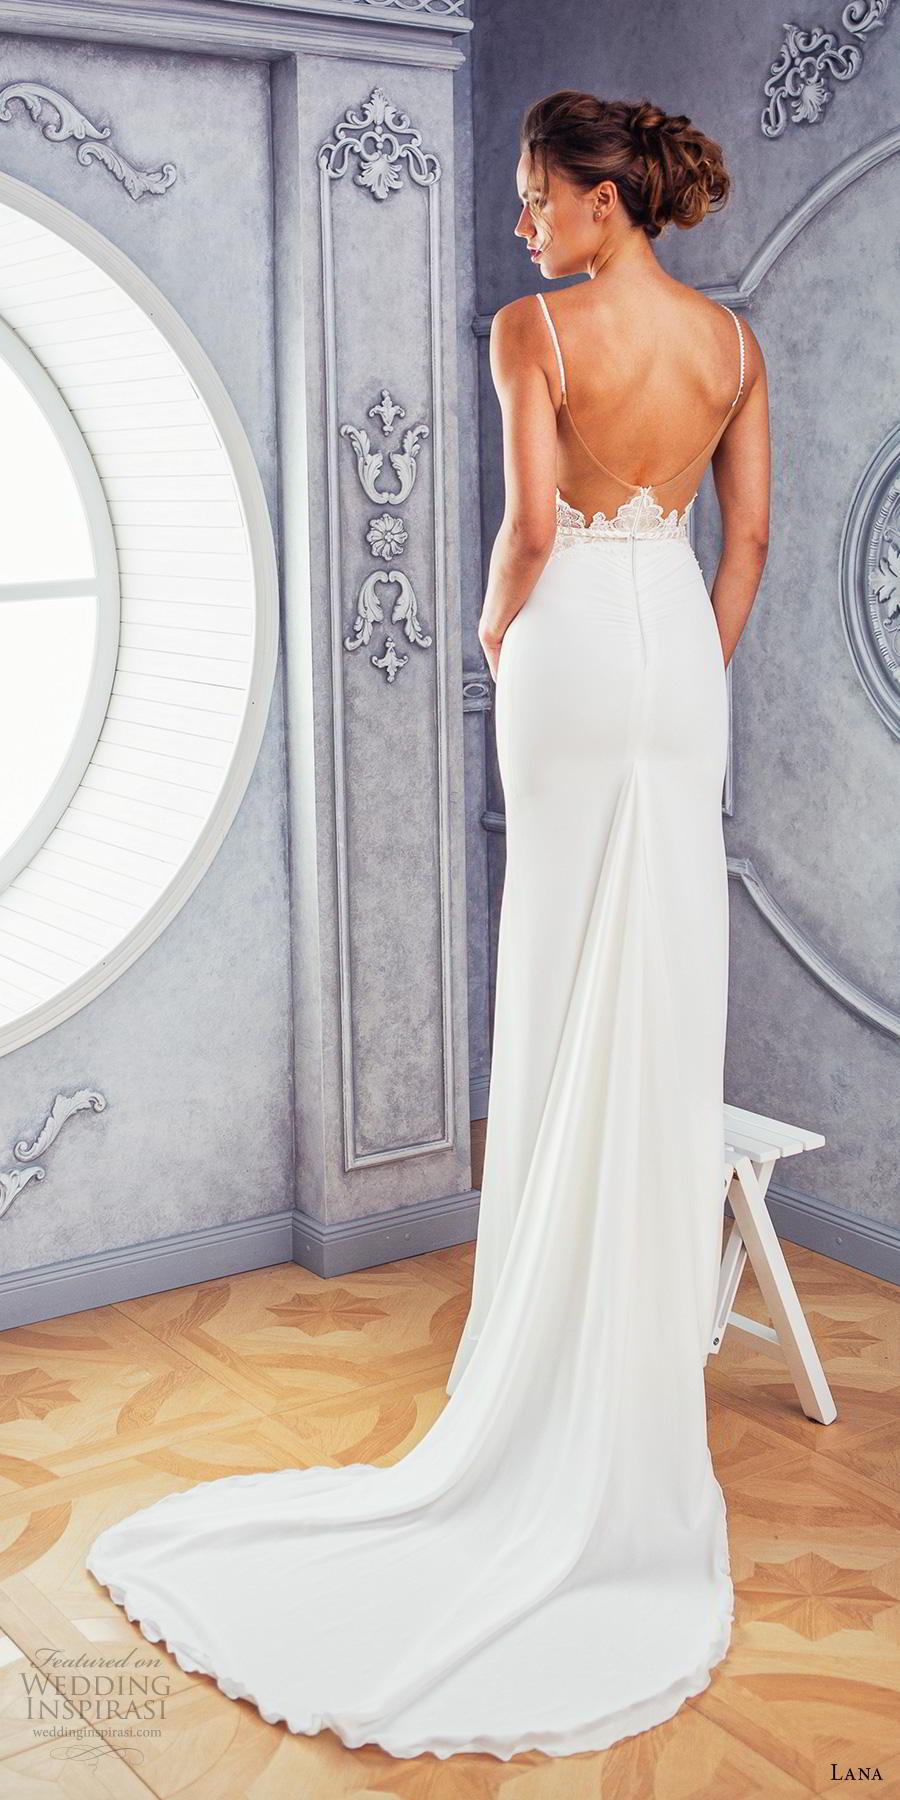 lana 2018 bridal spaghetti strap deep sweetheart neckline heavily embellished bodice satin skirt elegant sheath fit and flare wedding dress medium train (4) bv